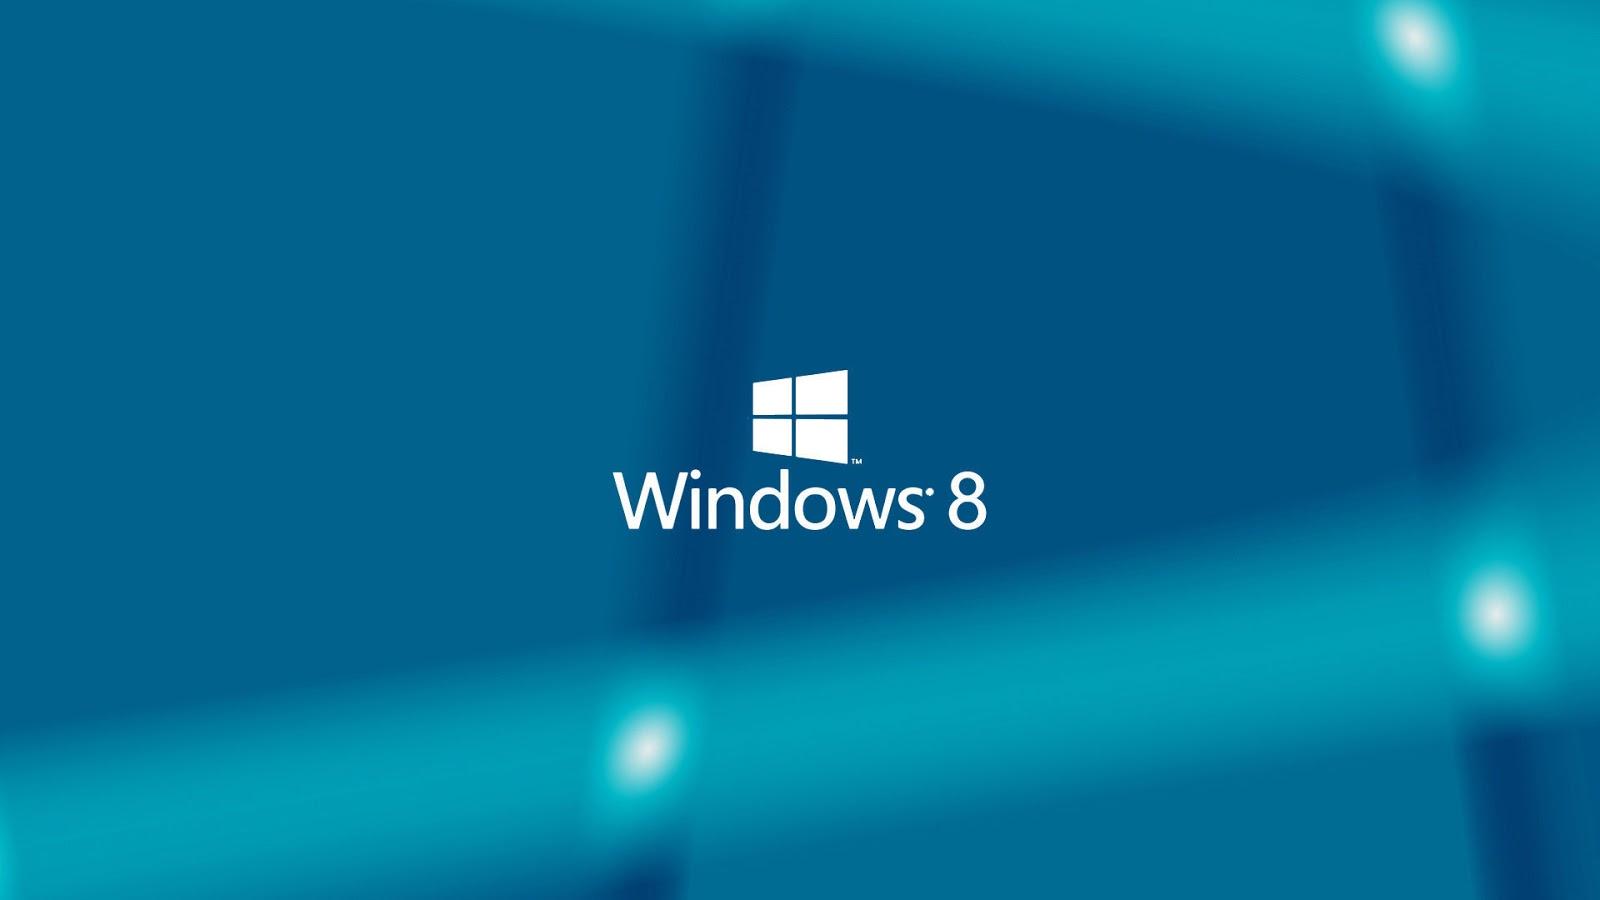 Parkwahnsinn windows 8 full download